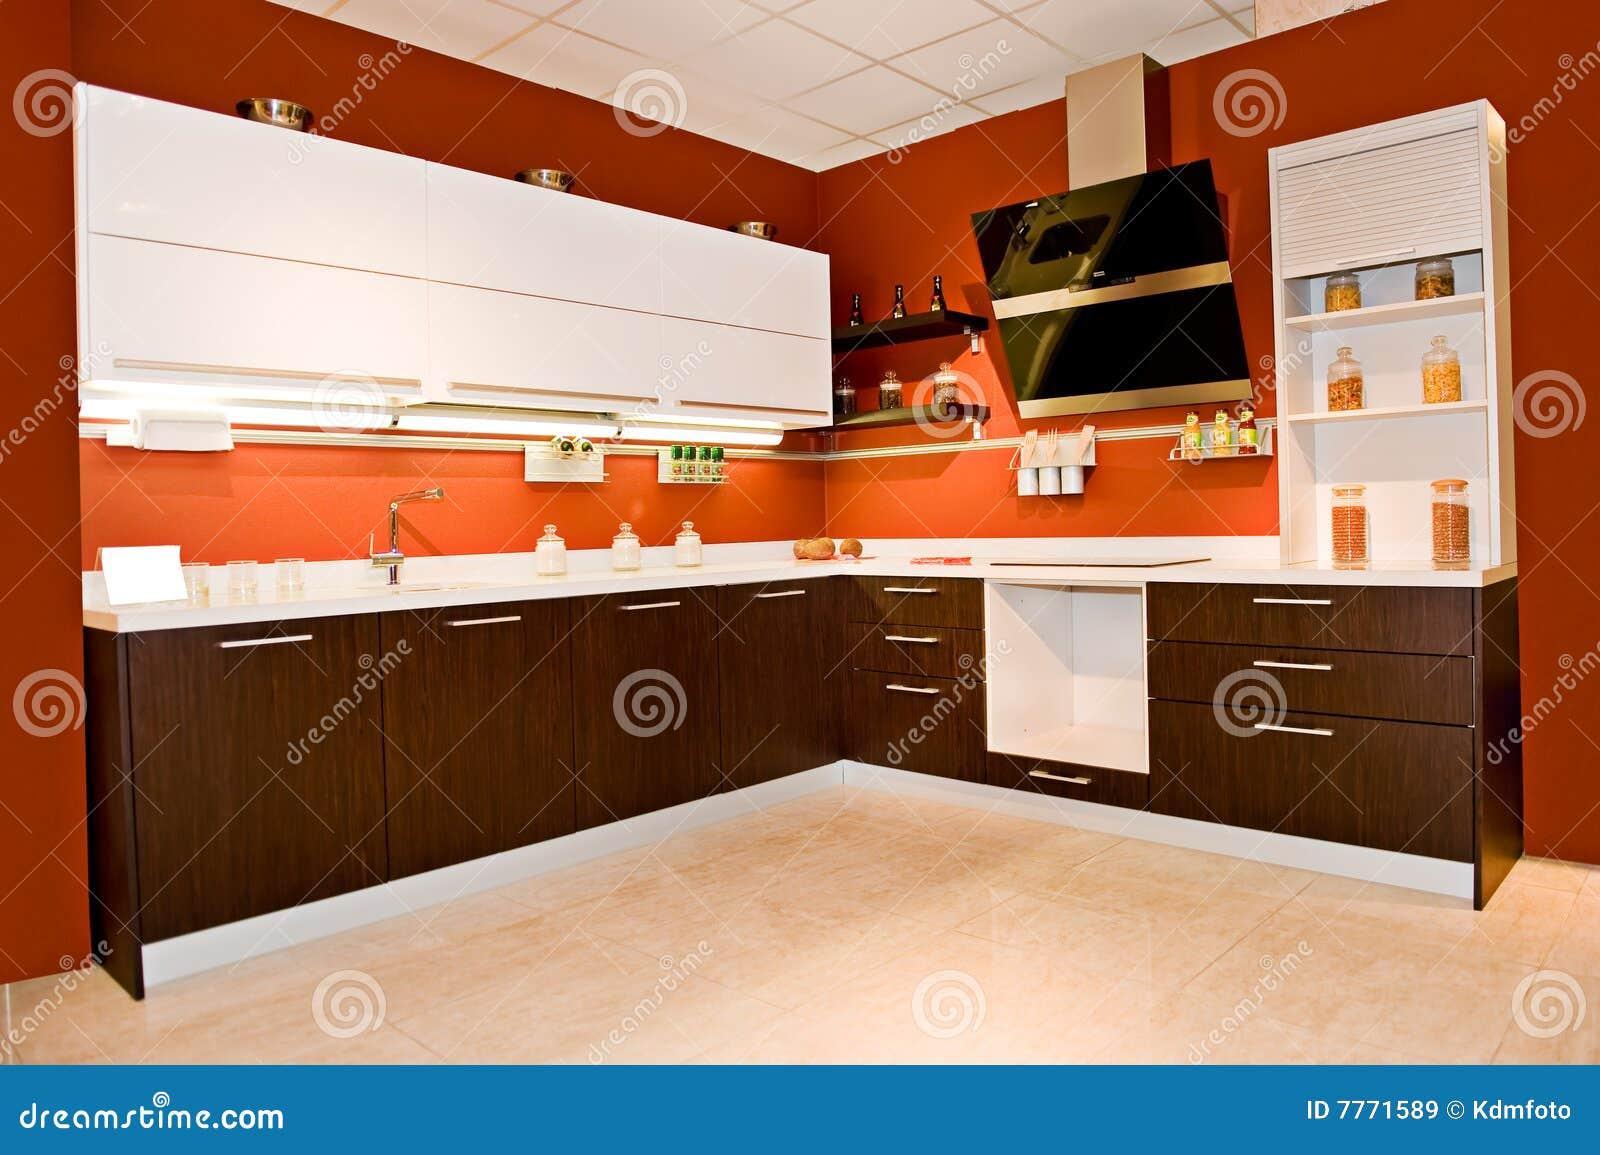 Cucina angolare moderna immagini stock libere da diritti - Immagini da cucina ...